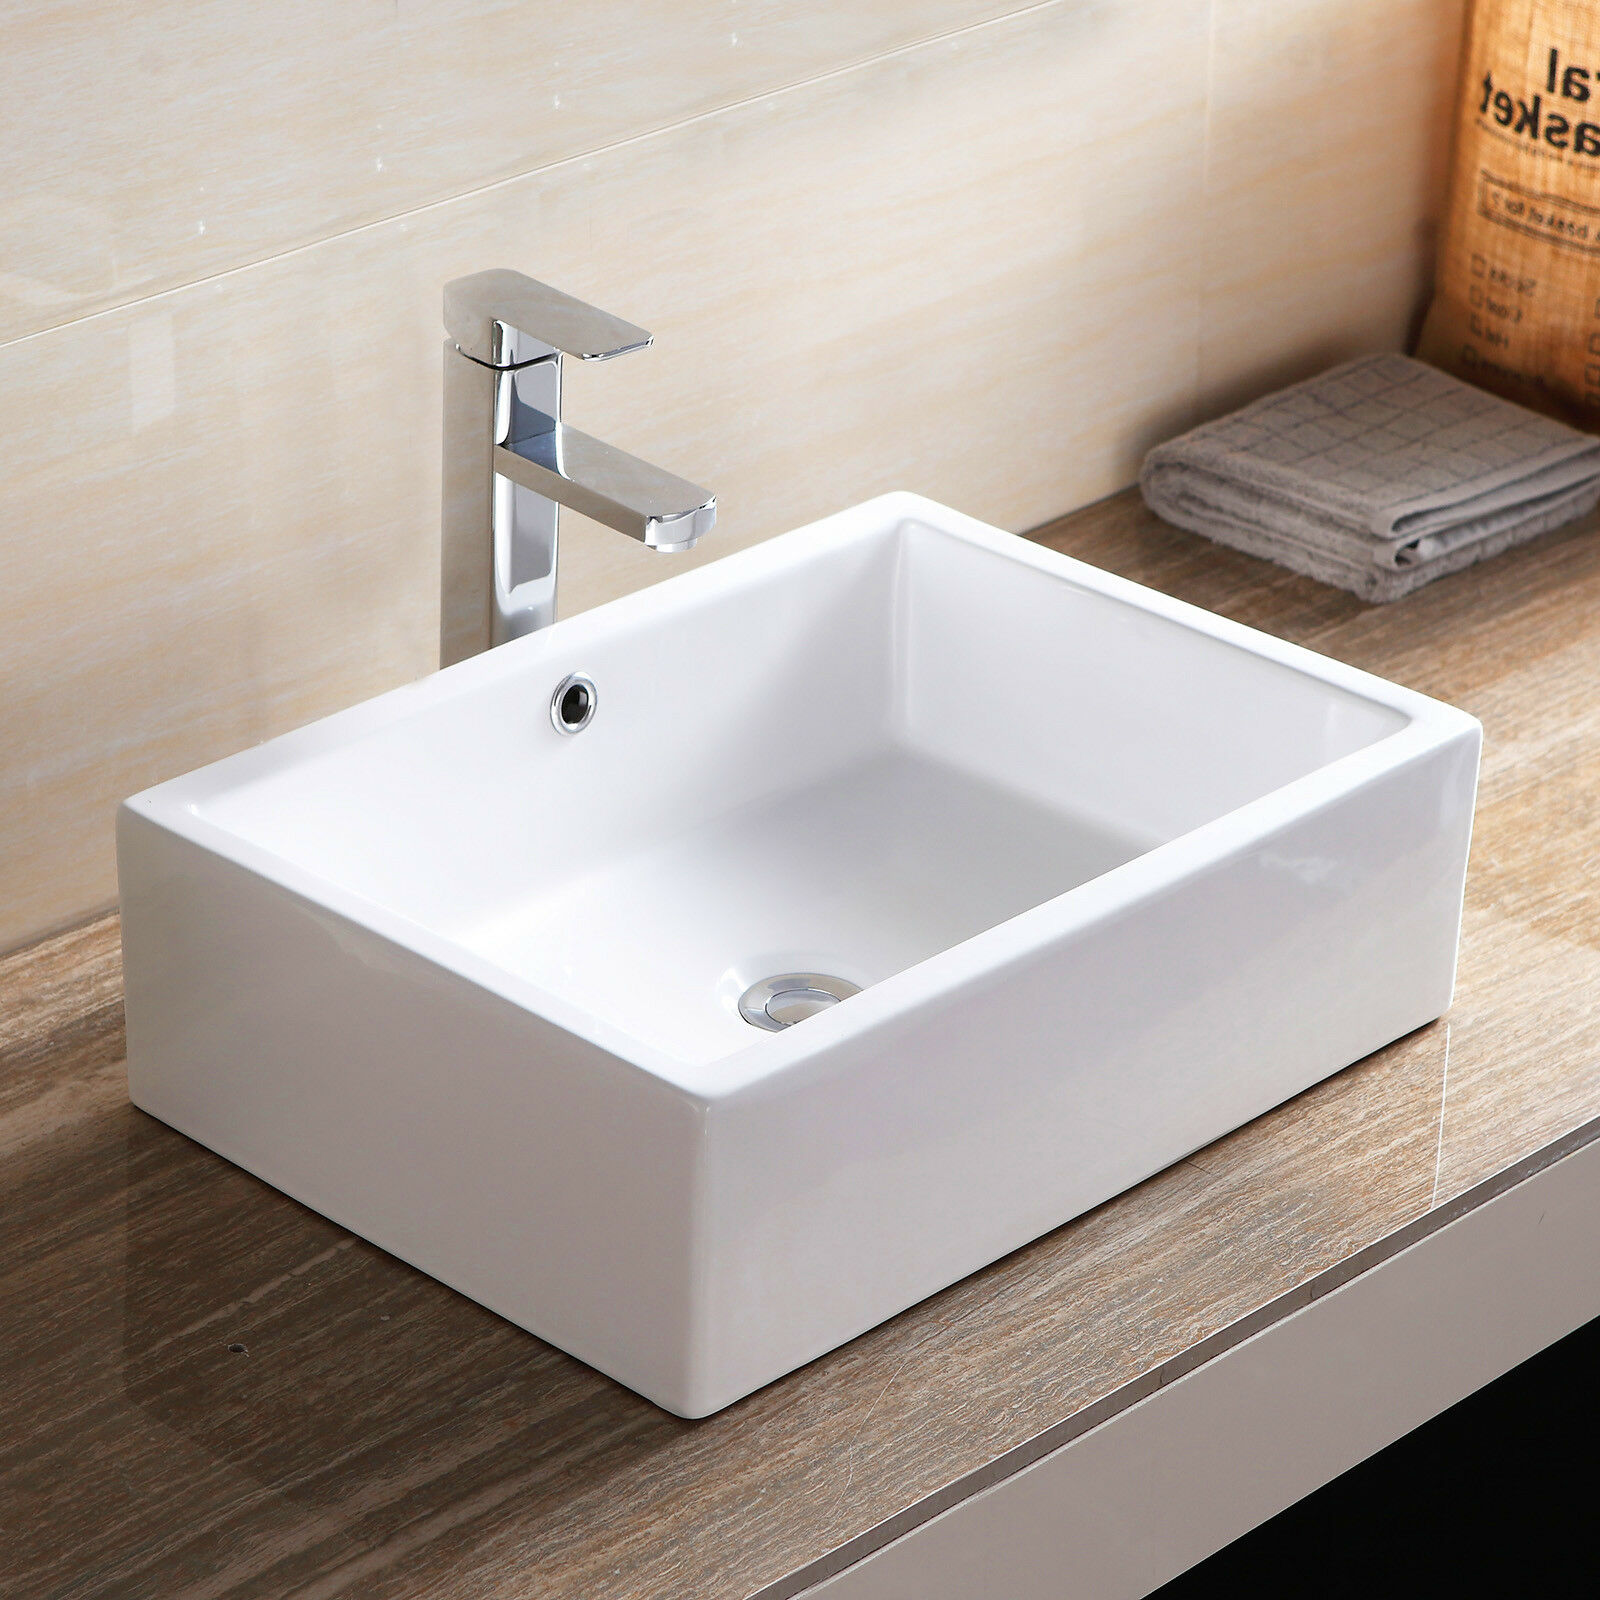 Bathroom Rectangle Porcelain Ceramic Vessel Sink Basin Bowl Faucet Popup  Drain